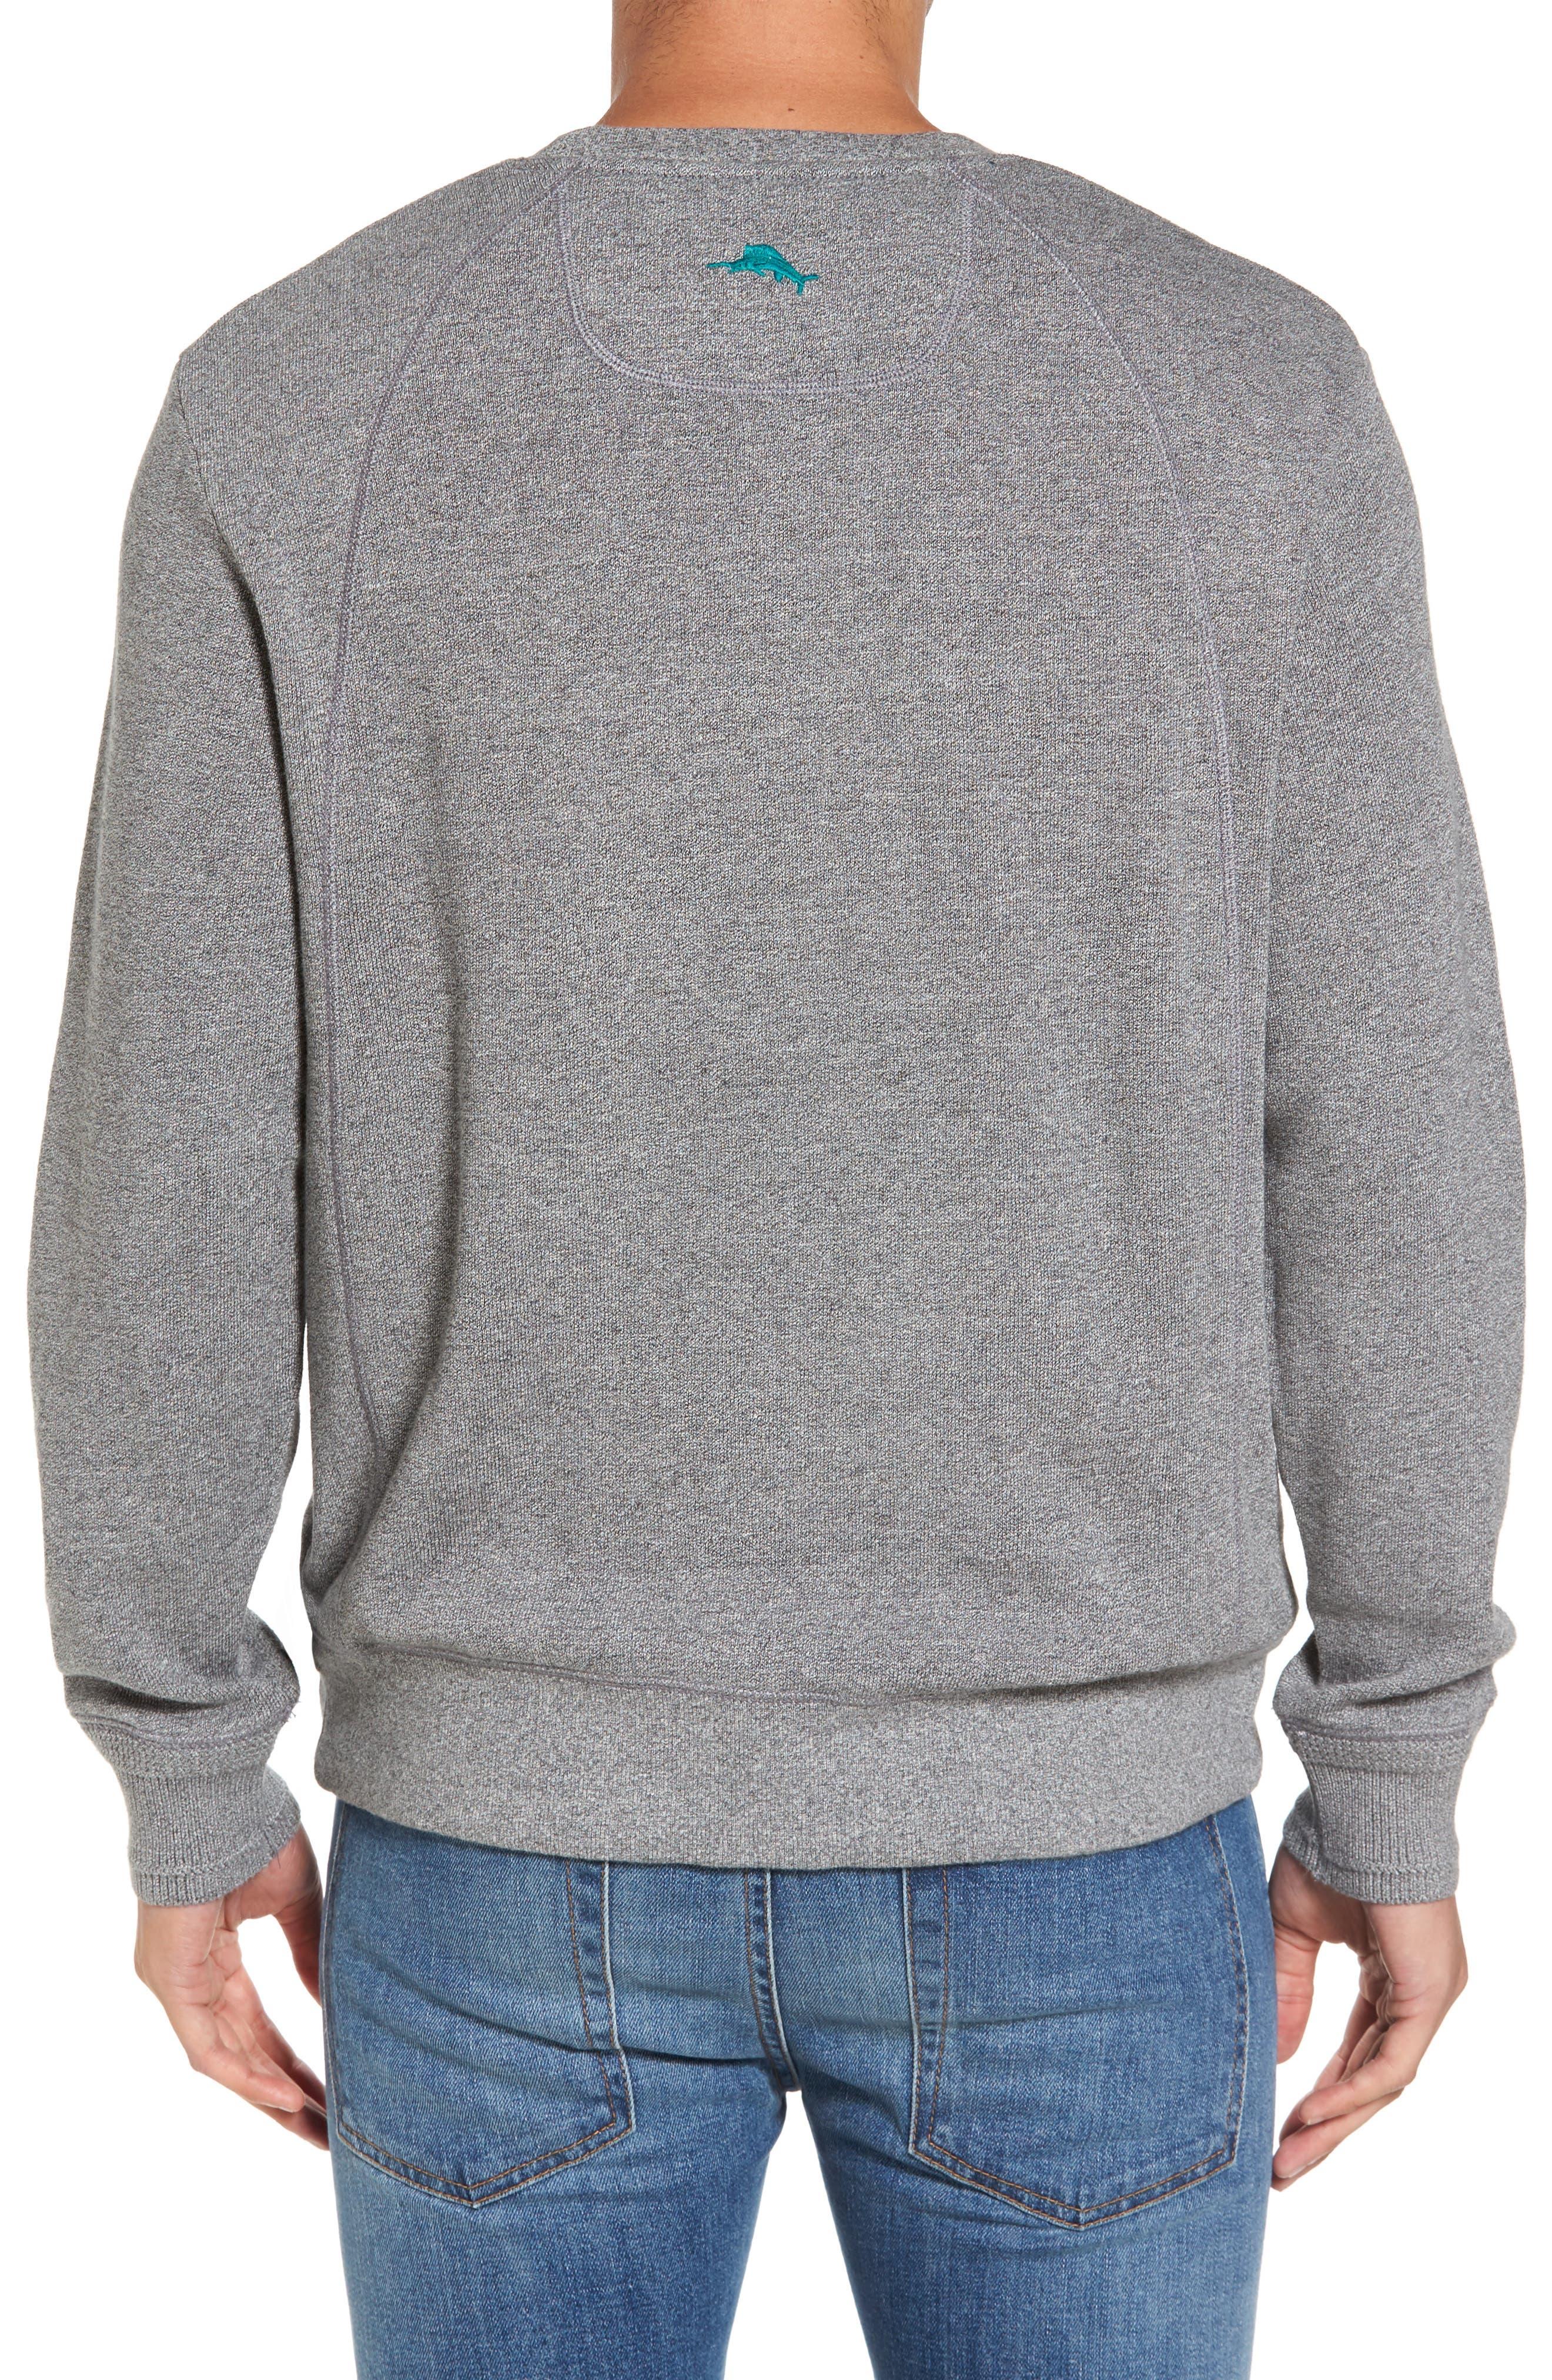 NFL Stitch of Liberty Embroidered Crewneck Sweatshirt,                             Alternate thumbnail 45, color,